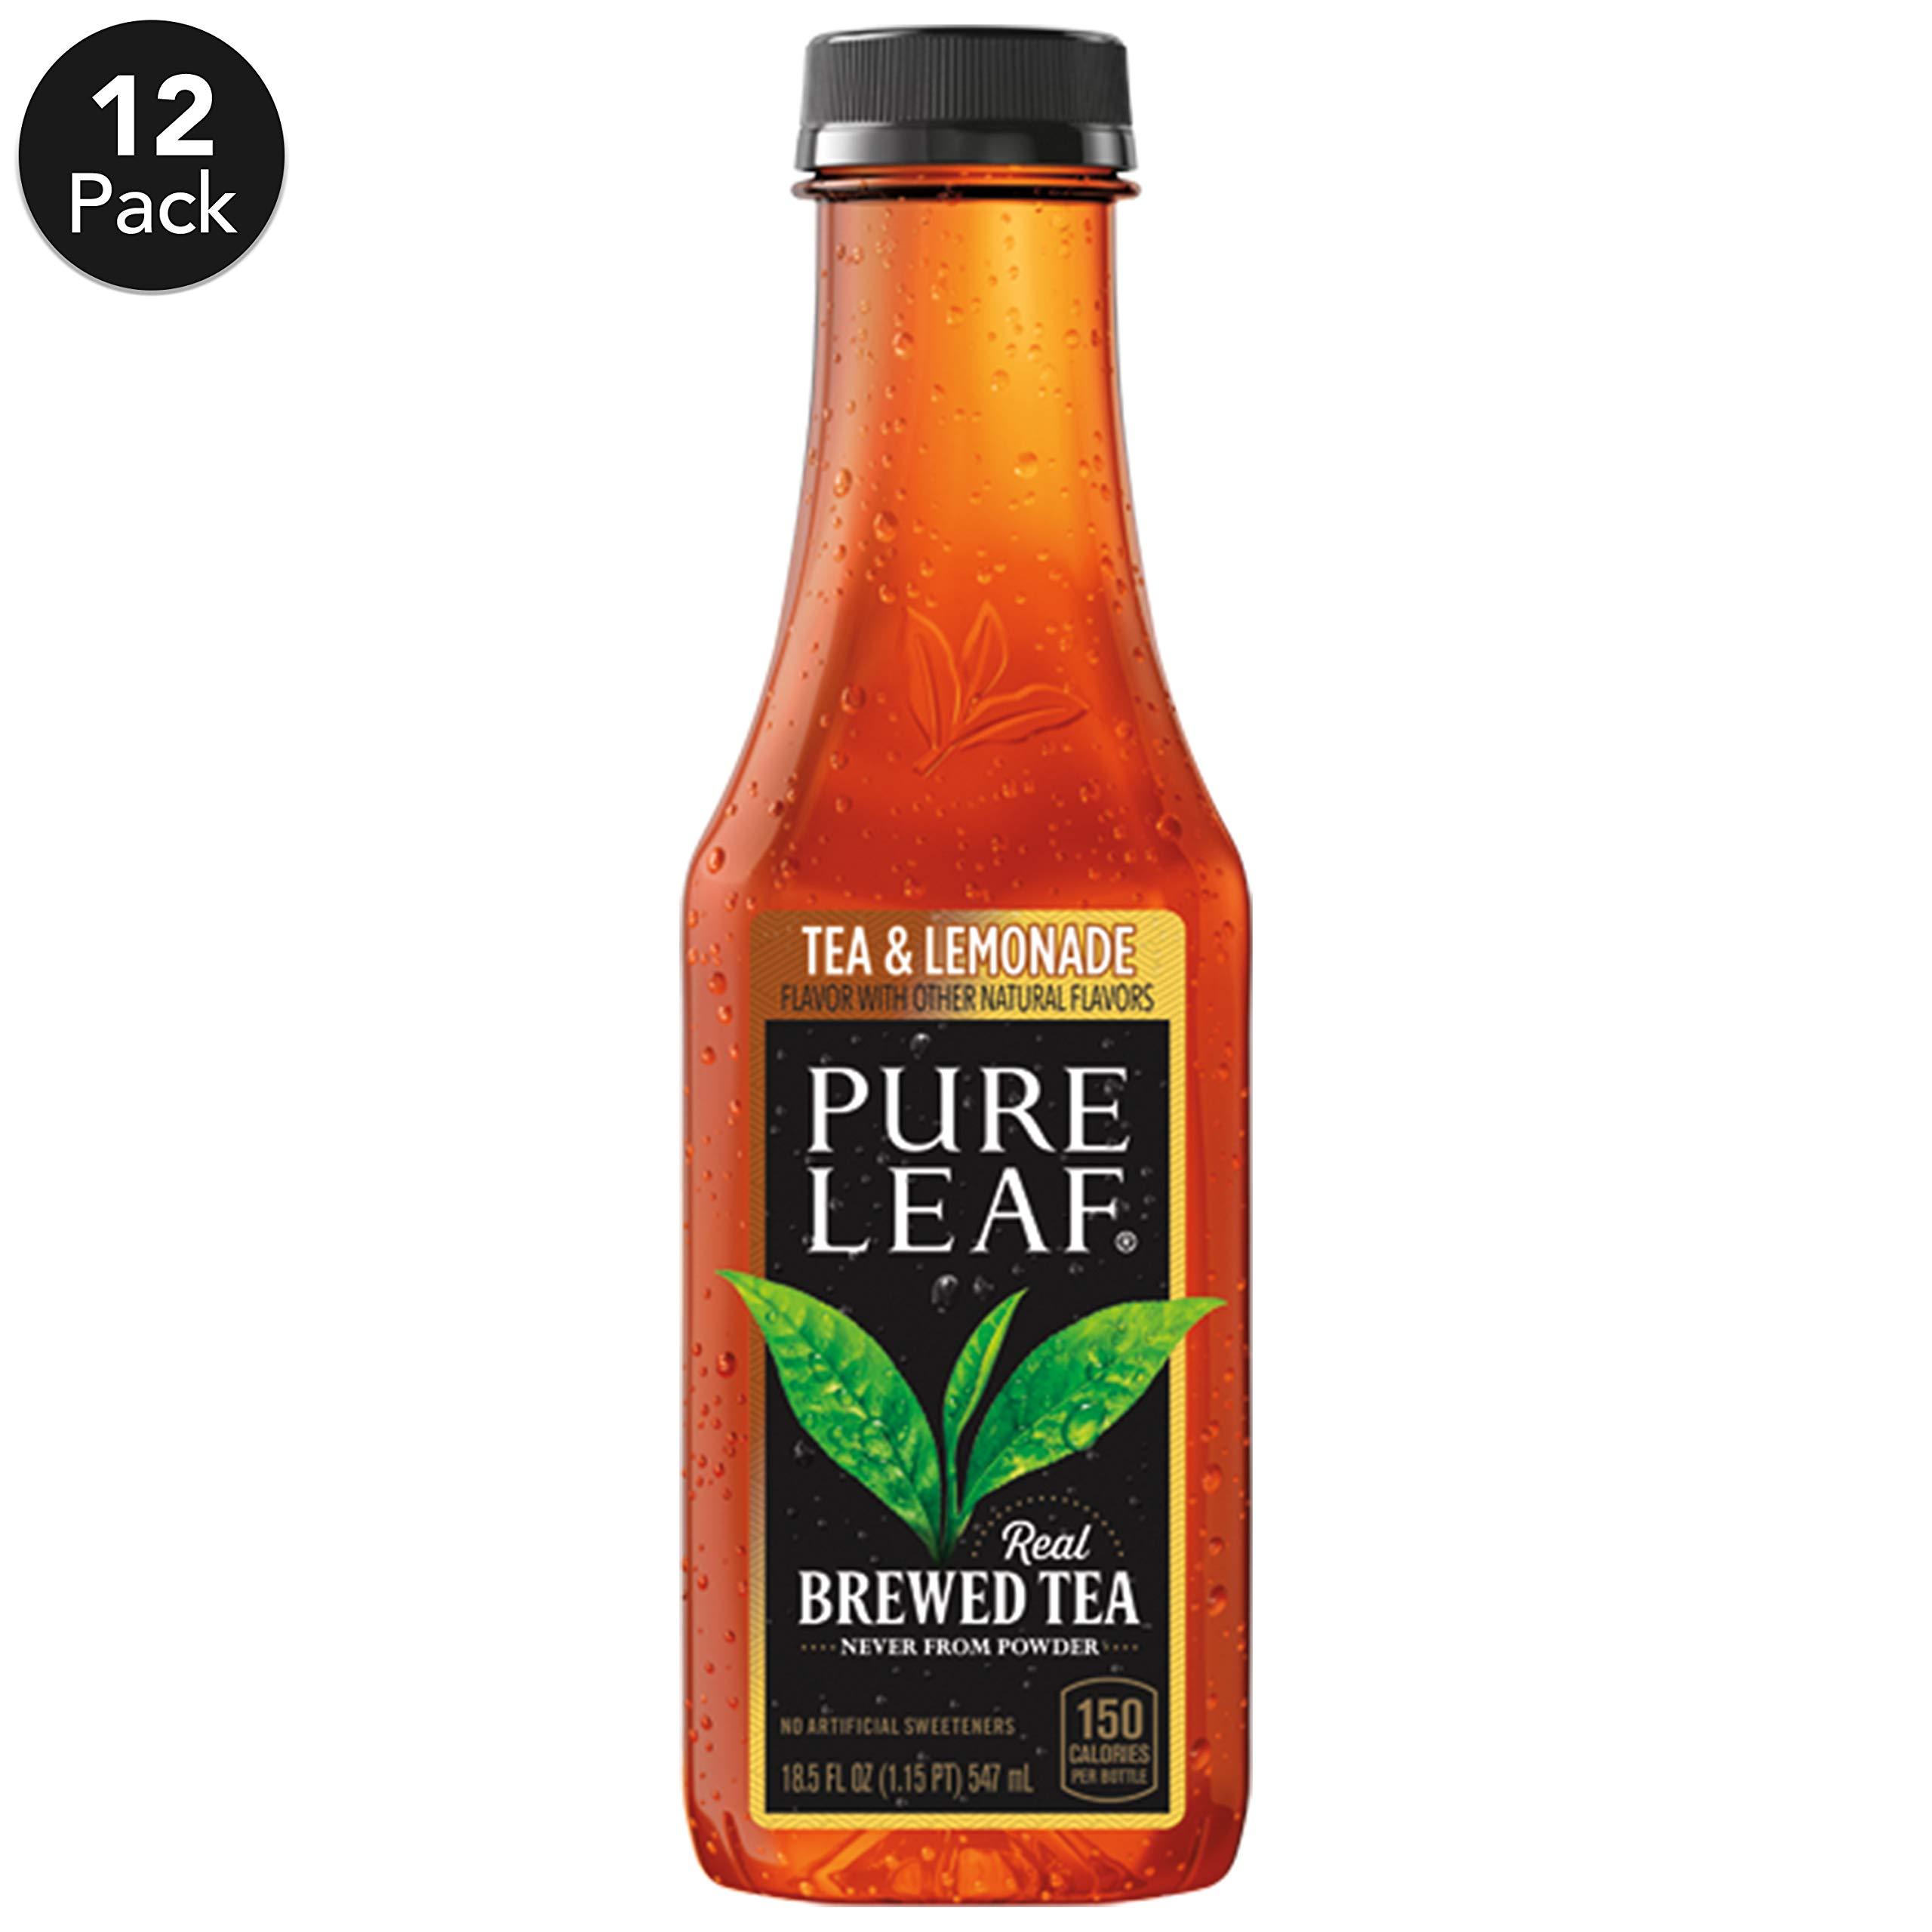 Pure Leaf Iced Tea, Tea and Lemonade, Real Brewed Black Tea, 18.5  Fl. Oz Bottles (Pack of 12) by Pure Leaf